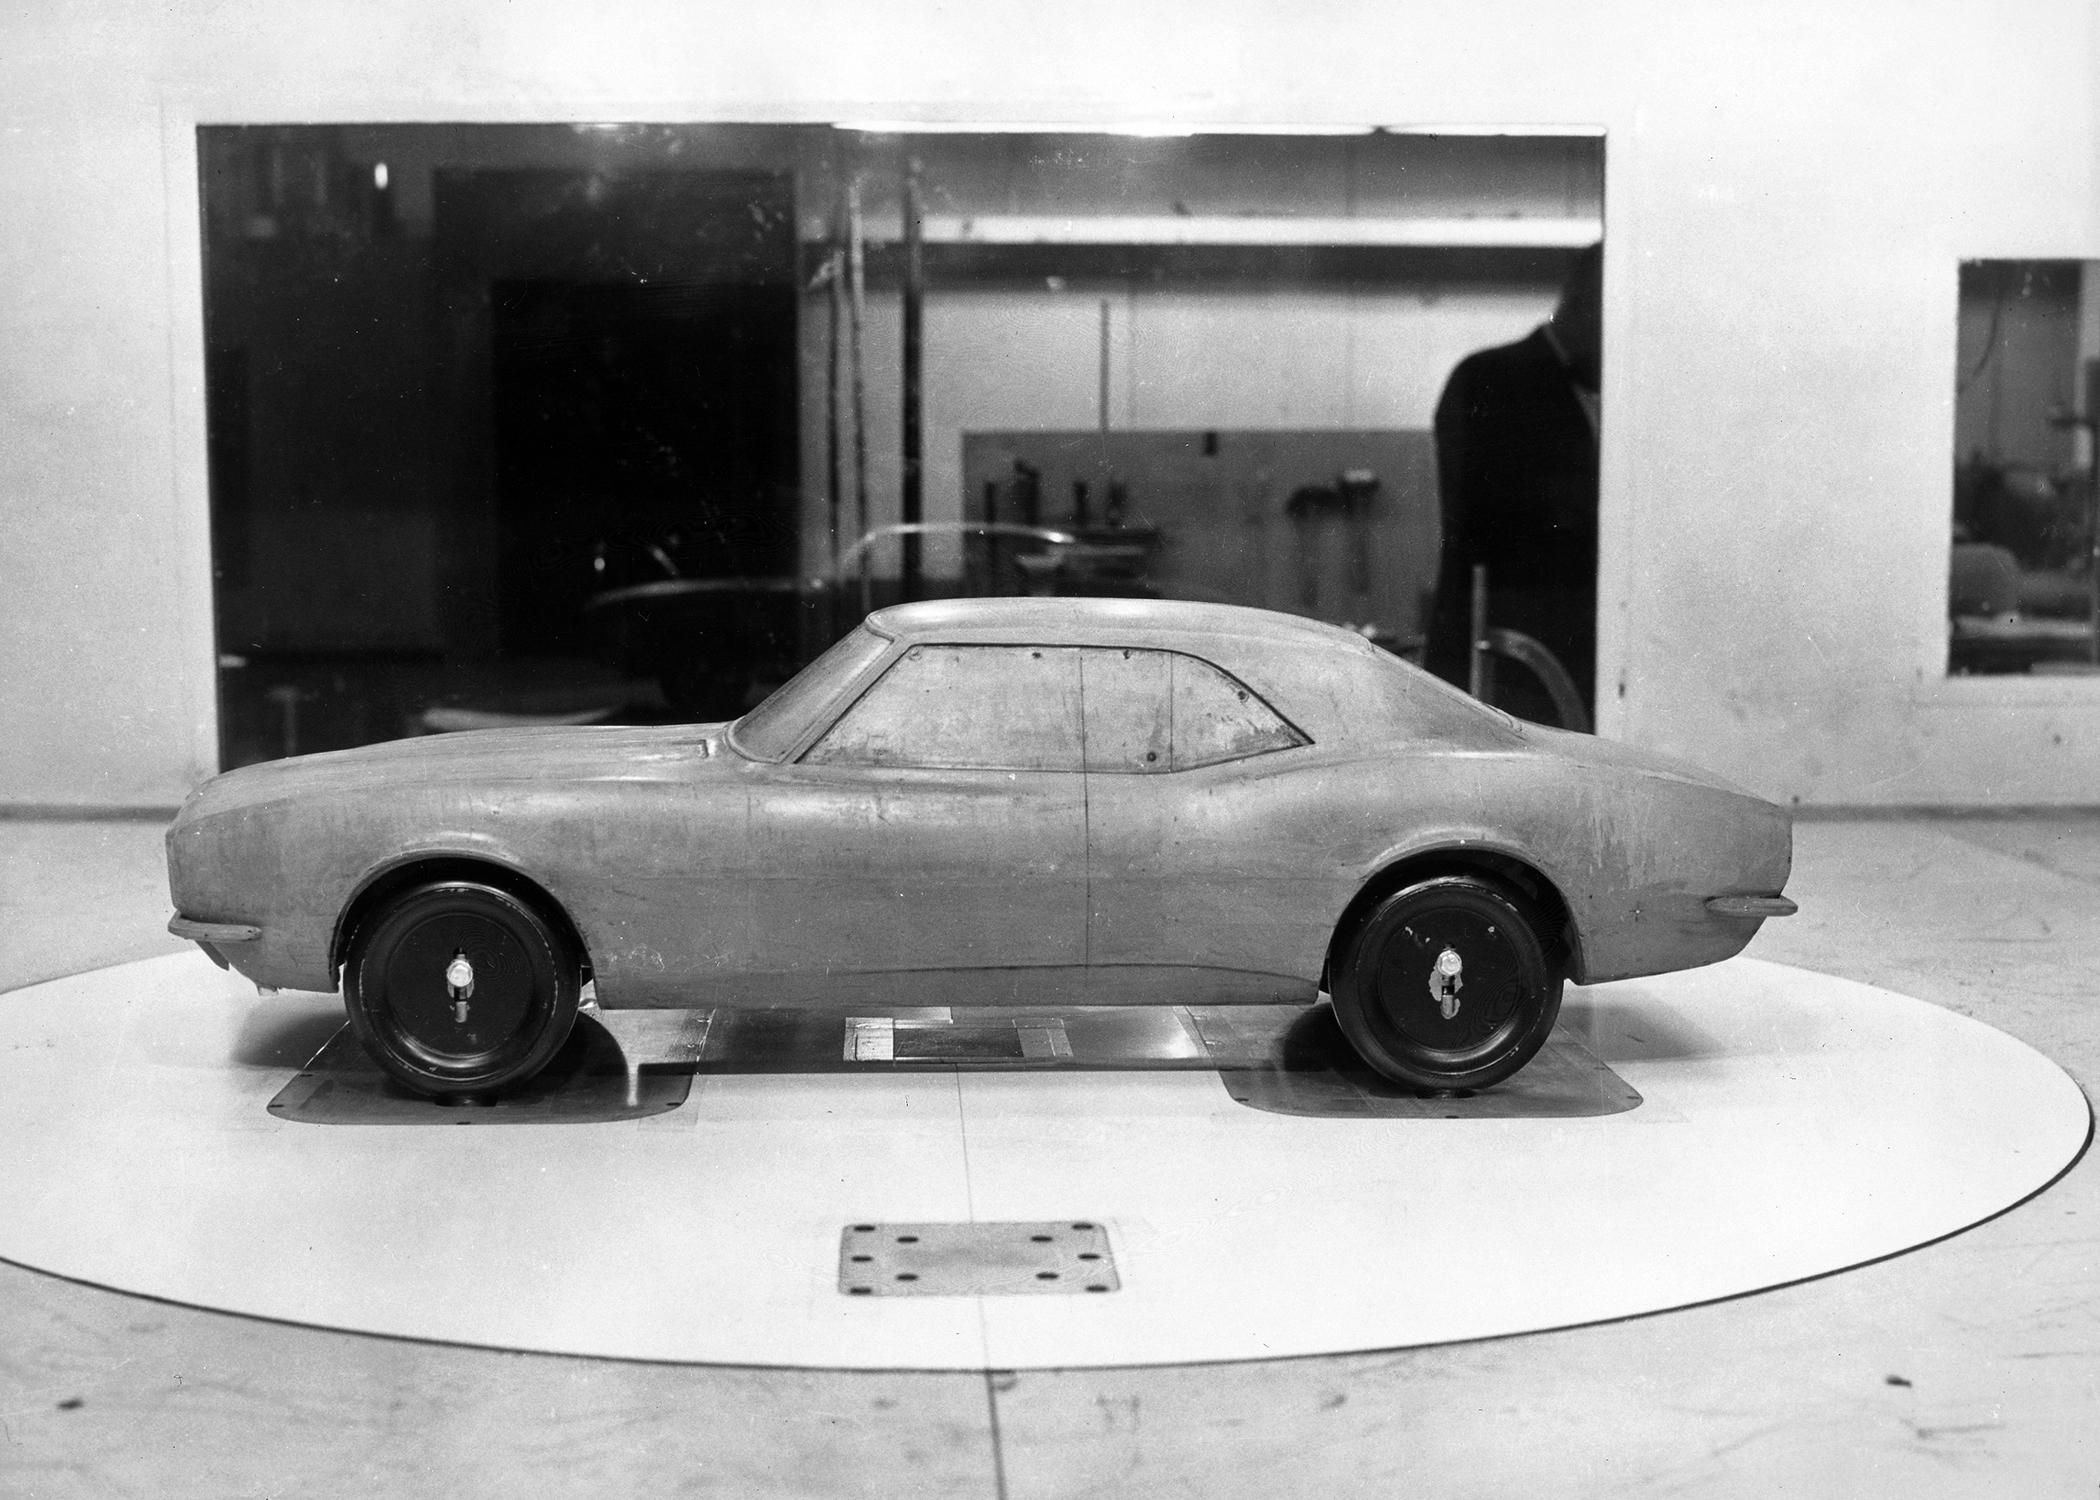 First Gen Camaro design clay model side profile